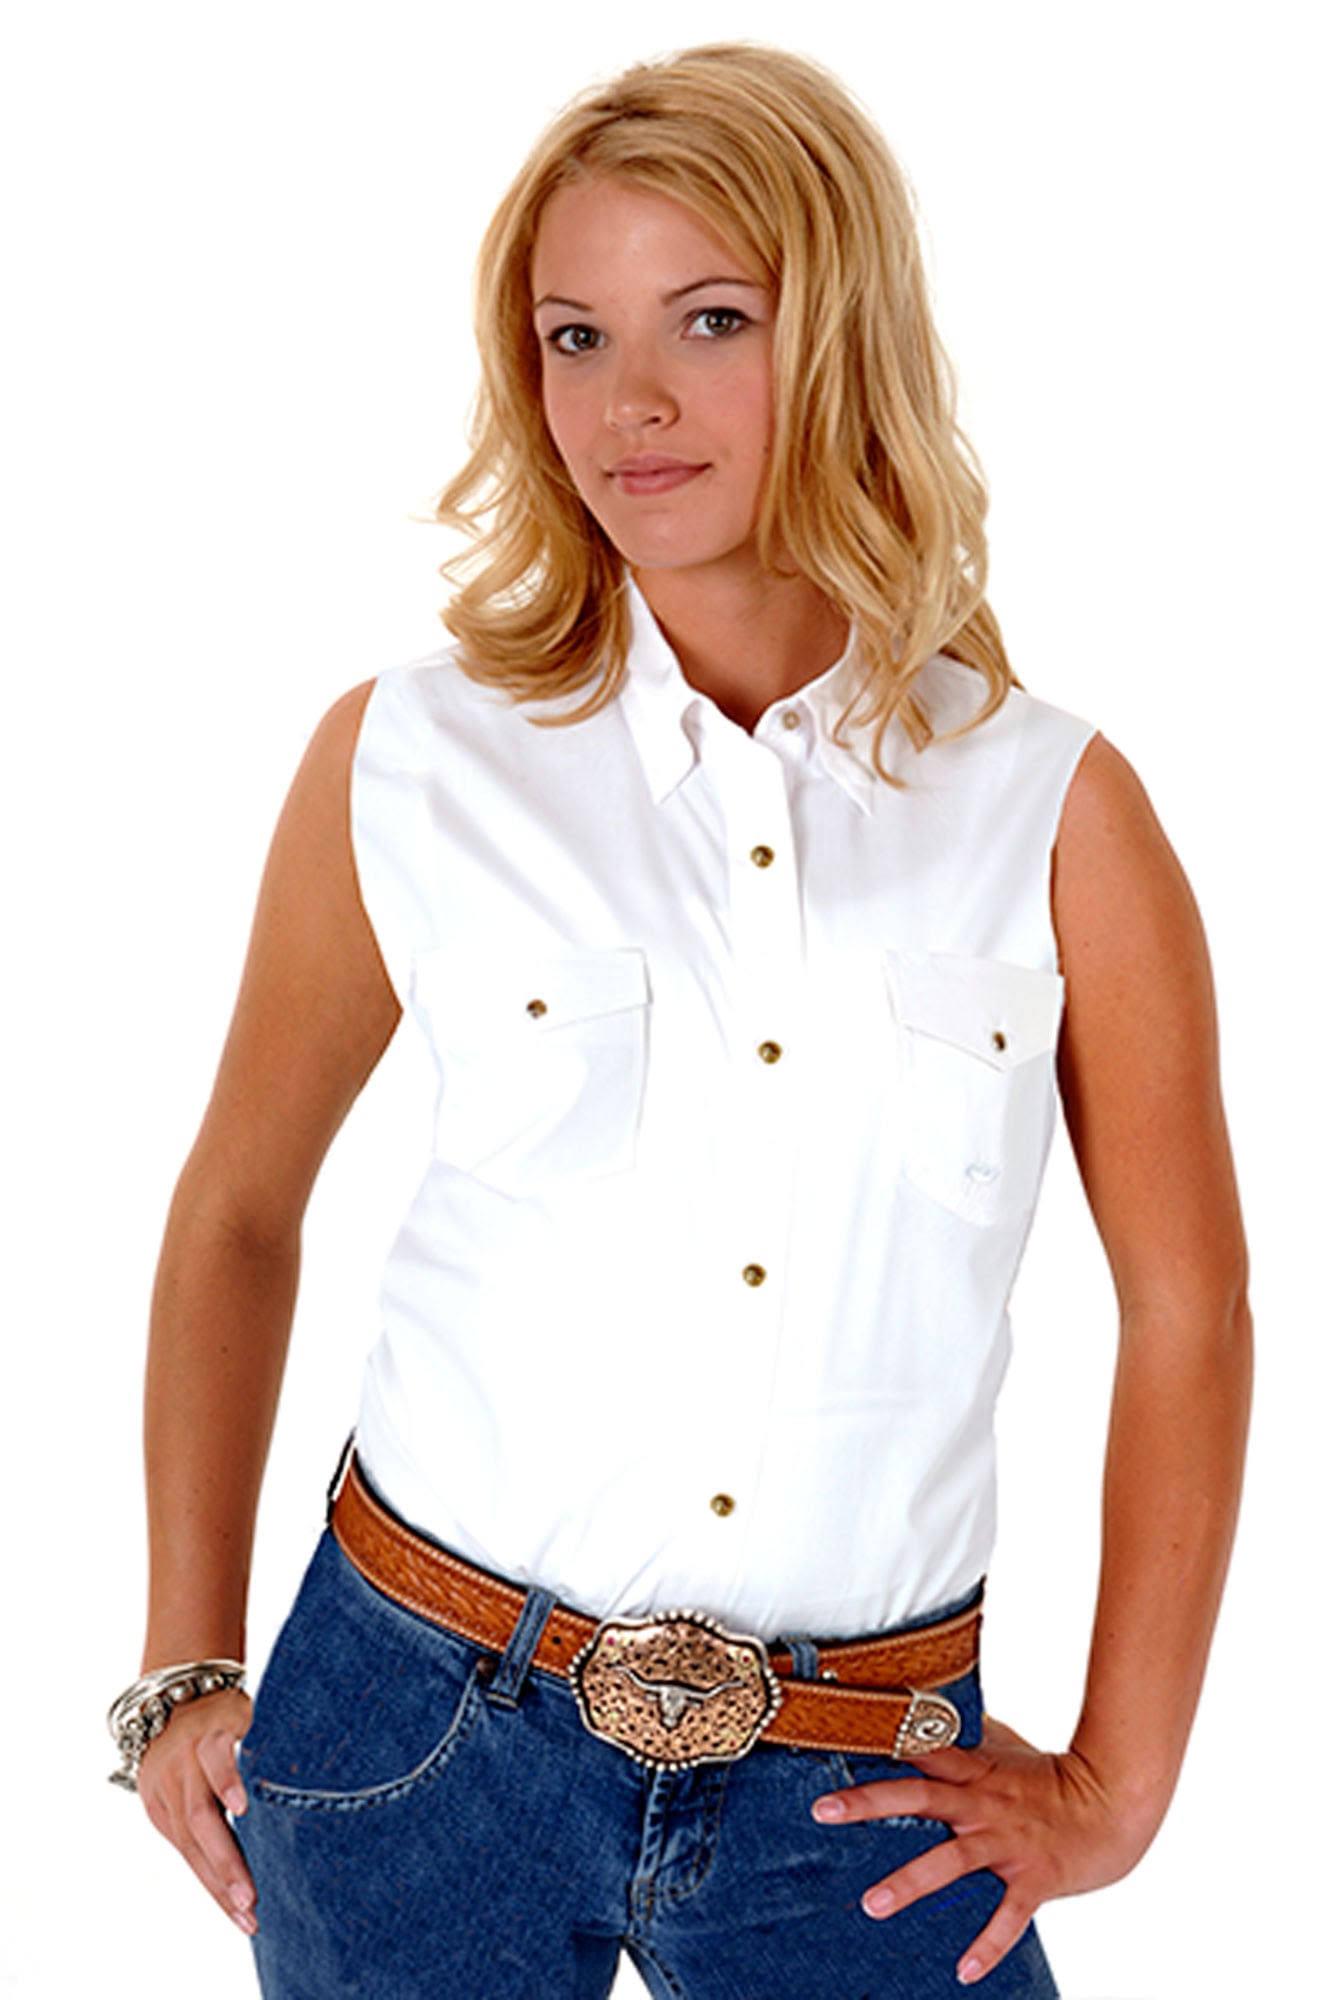 052 Western Seeveess 0025 Womens 03 Roper 0265 White Shirt Wh X7x7H